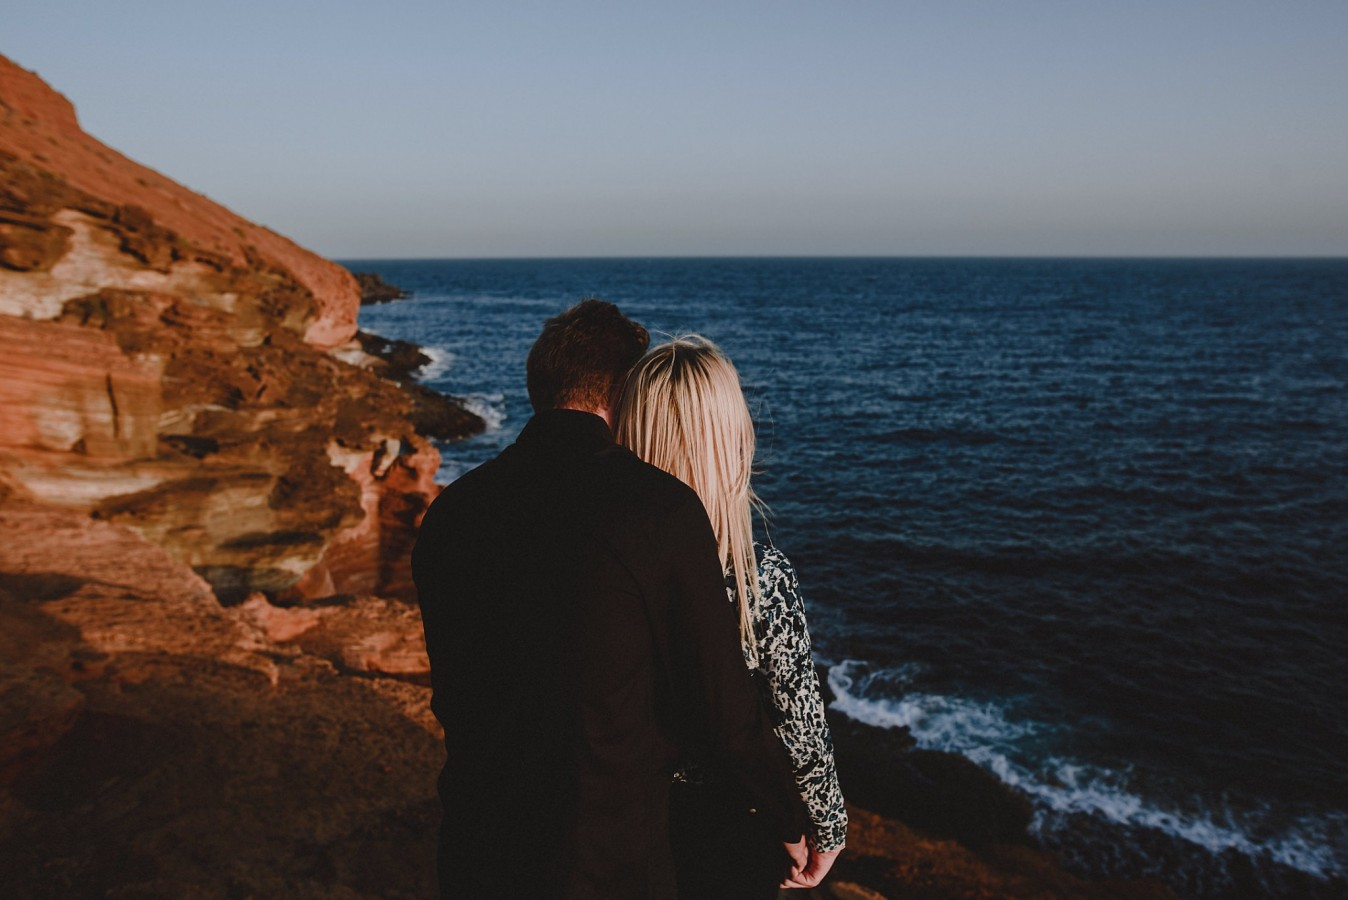 engagment-photo-shoot-tenerife-gran-canaria-photography-wedding-3685